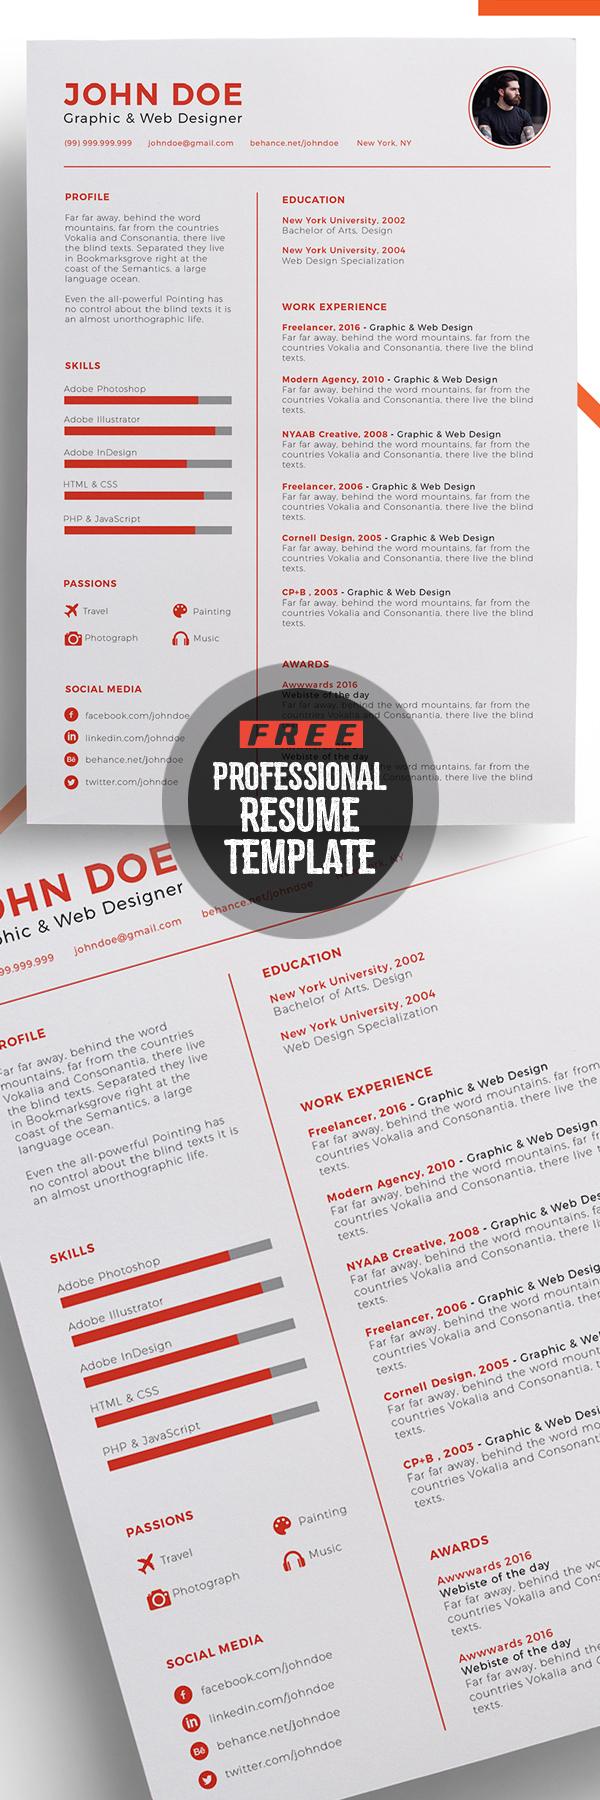 Professional Free Resume Template Design